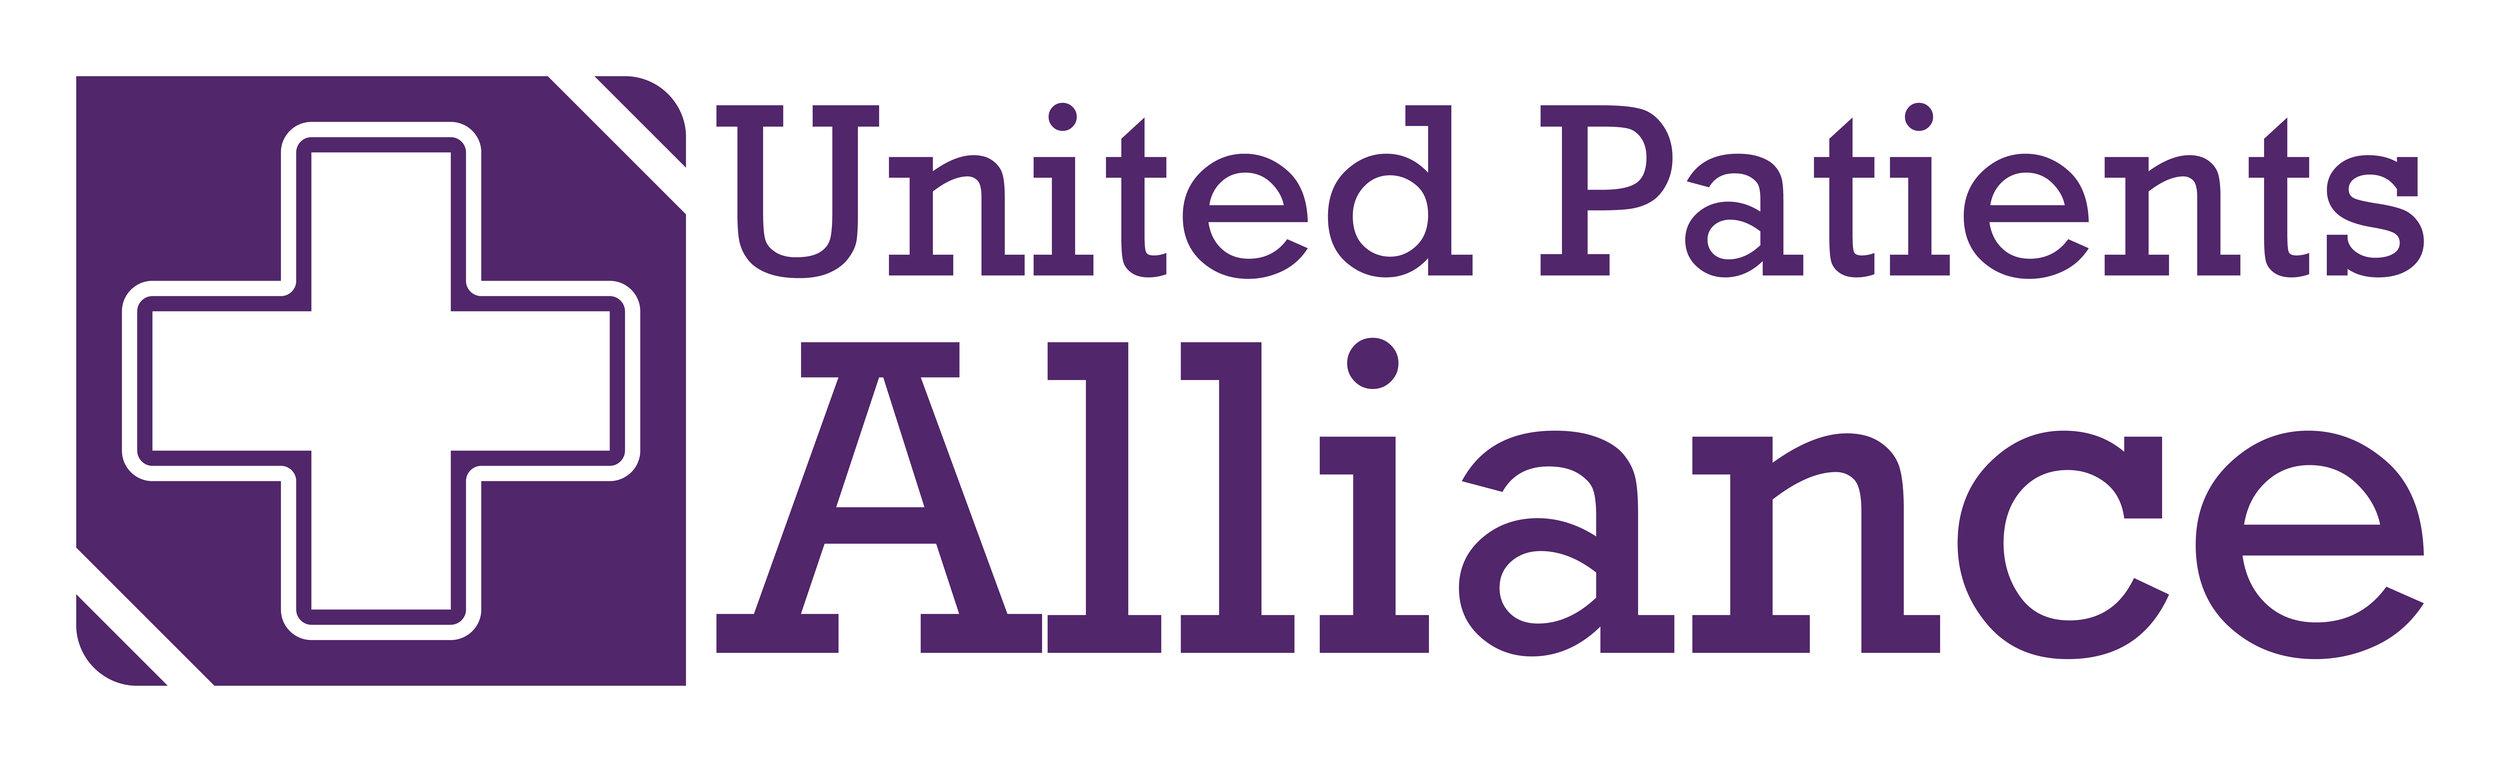 United Patients Alliance -